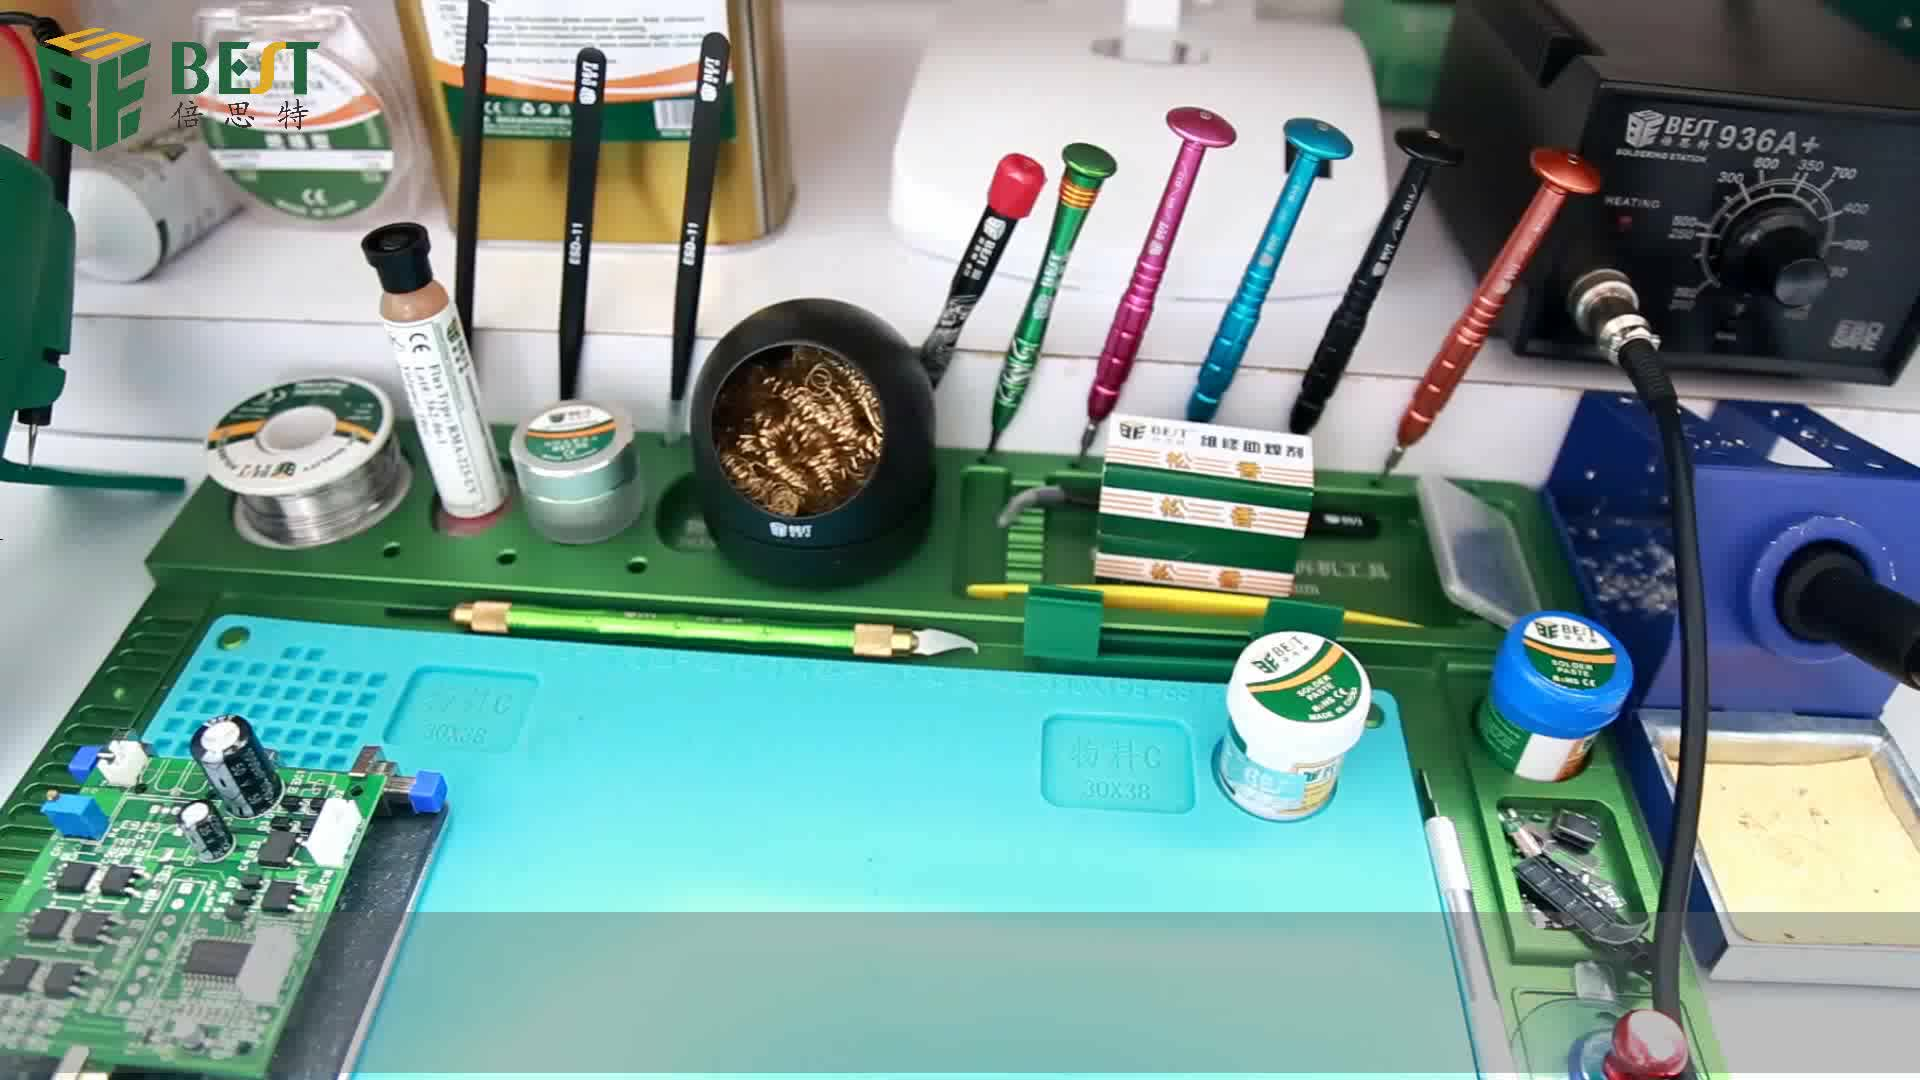 Welding Soldering Accessories Mayitr Solder Iron Tip Cleaner Ball Holder with Steel Wire Sponge